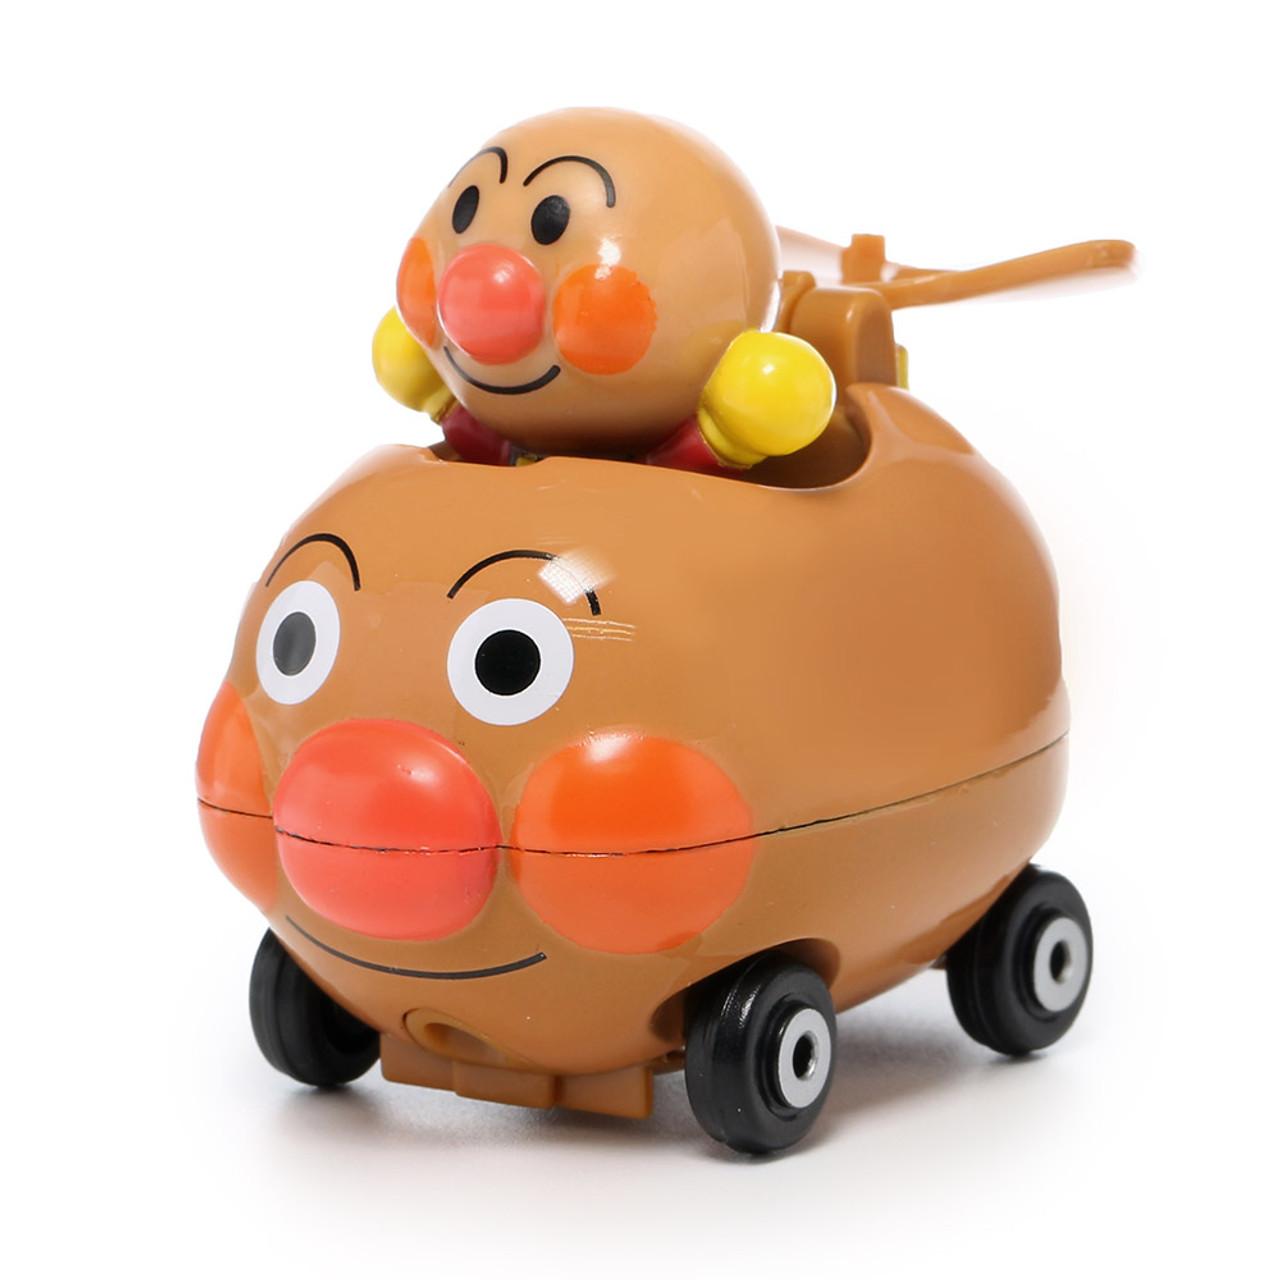 Sega Toys Anpanman Museum Go Go Mini Vehicle Carry Hero - Anpanman Car ( Front View )